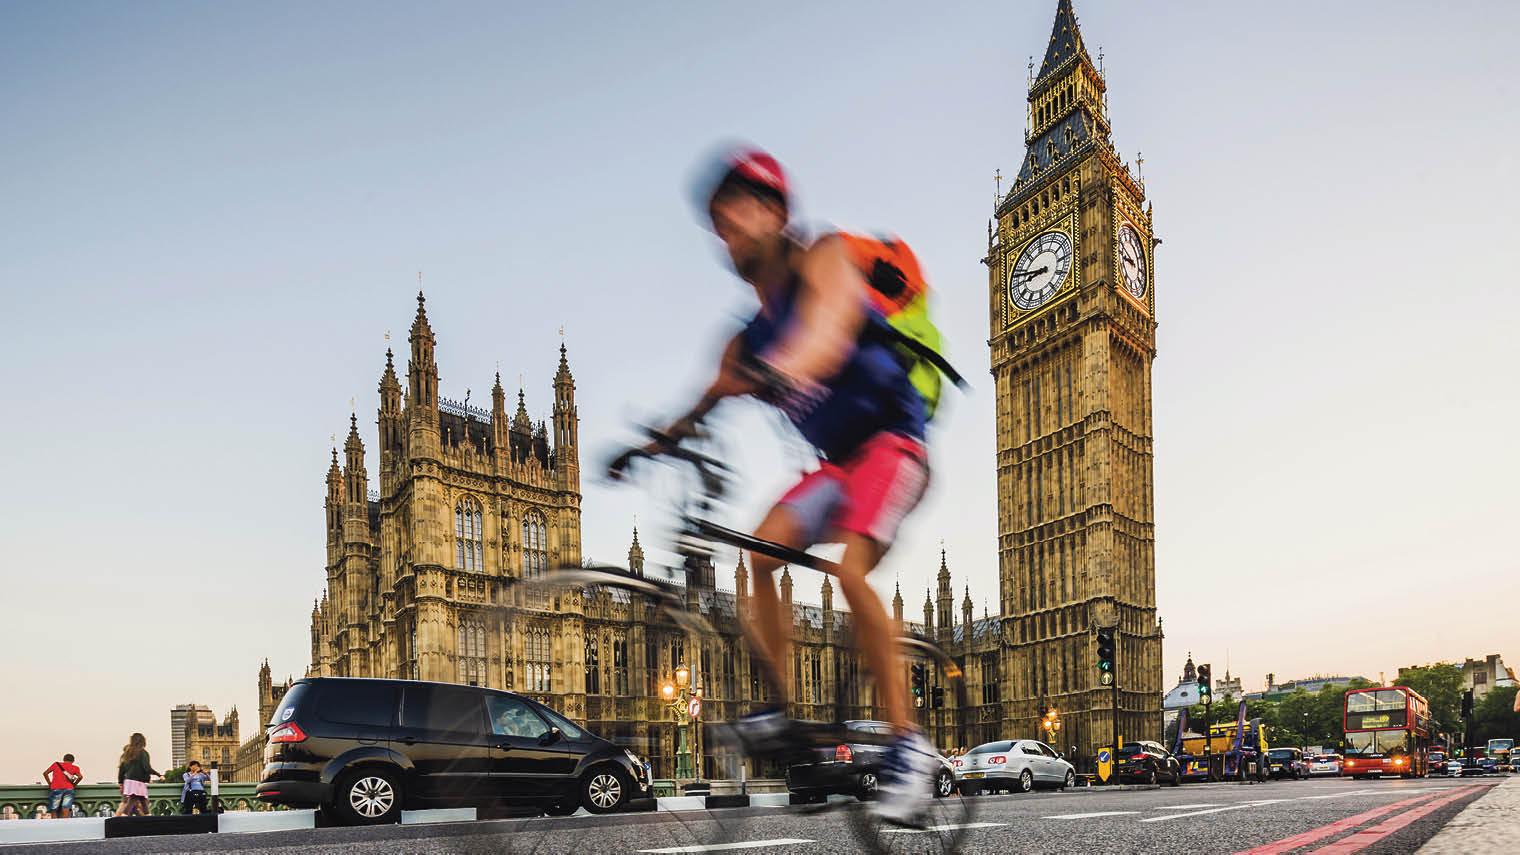 Man on bike outside Parliament